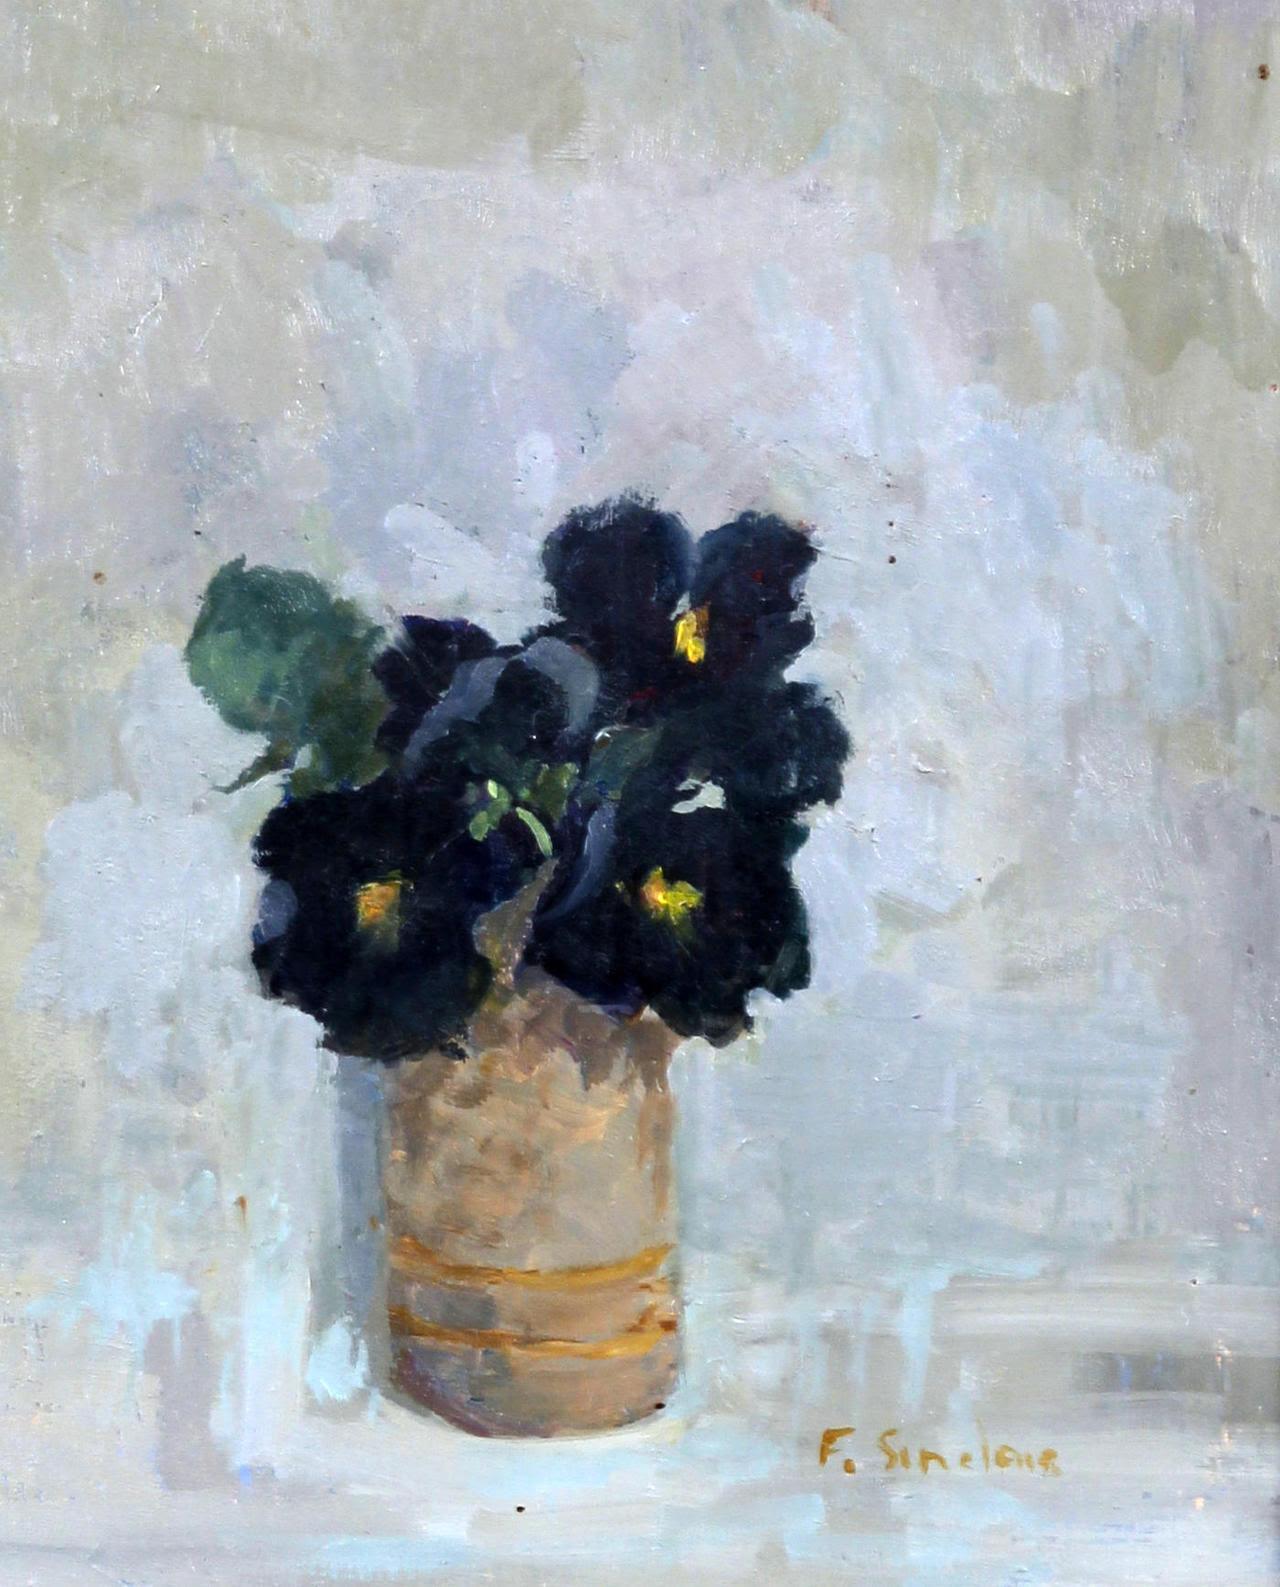 cacaotree:  Frances Sinclair (British, active circa 1980-circa 2000) 'Black Pansies'